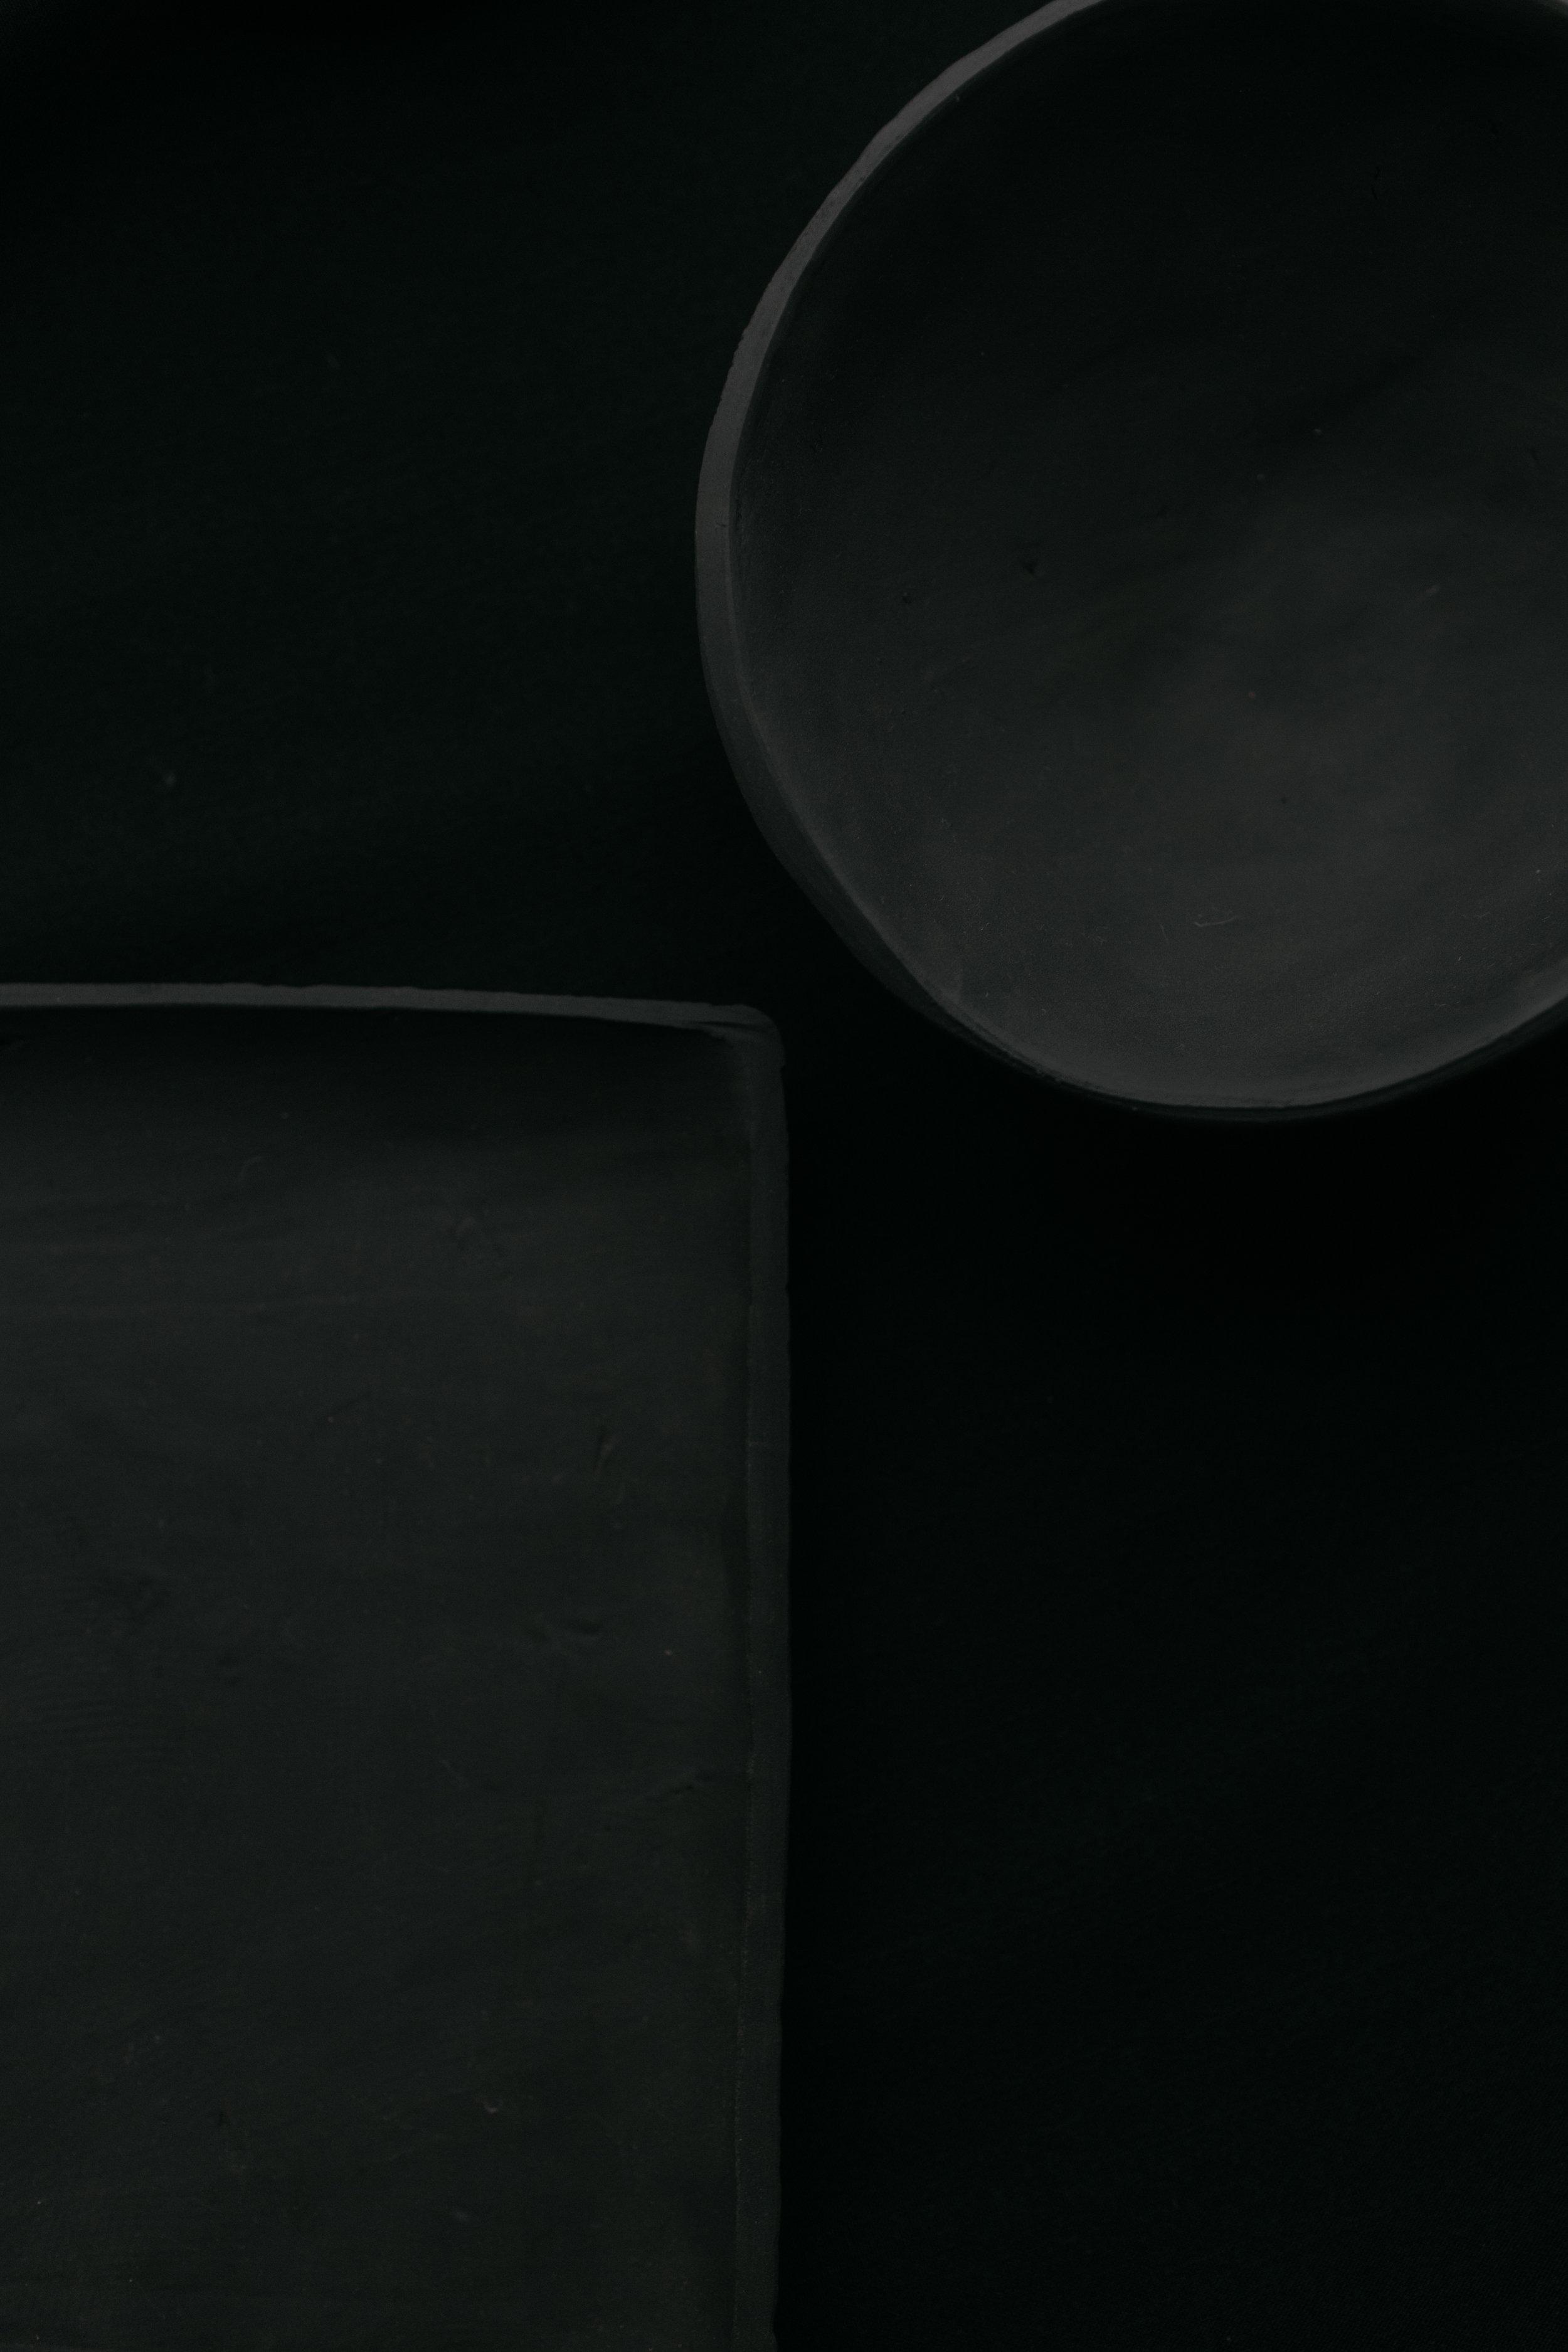 CivilStonware-EditOne-Anna-Howard-48.jpg